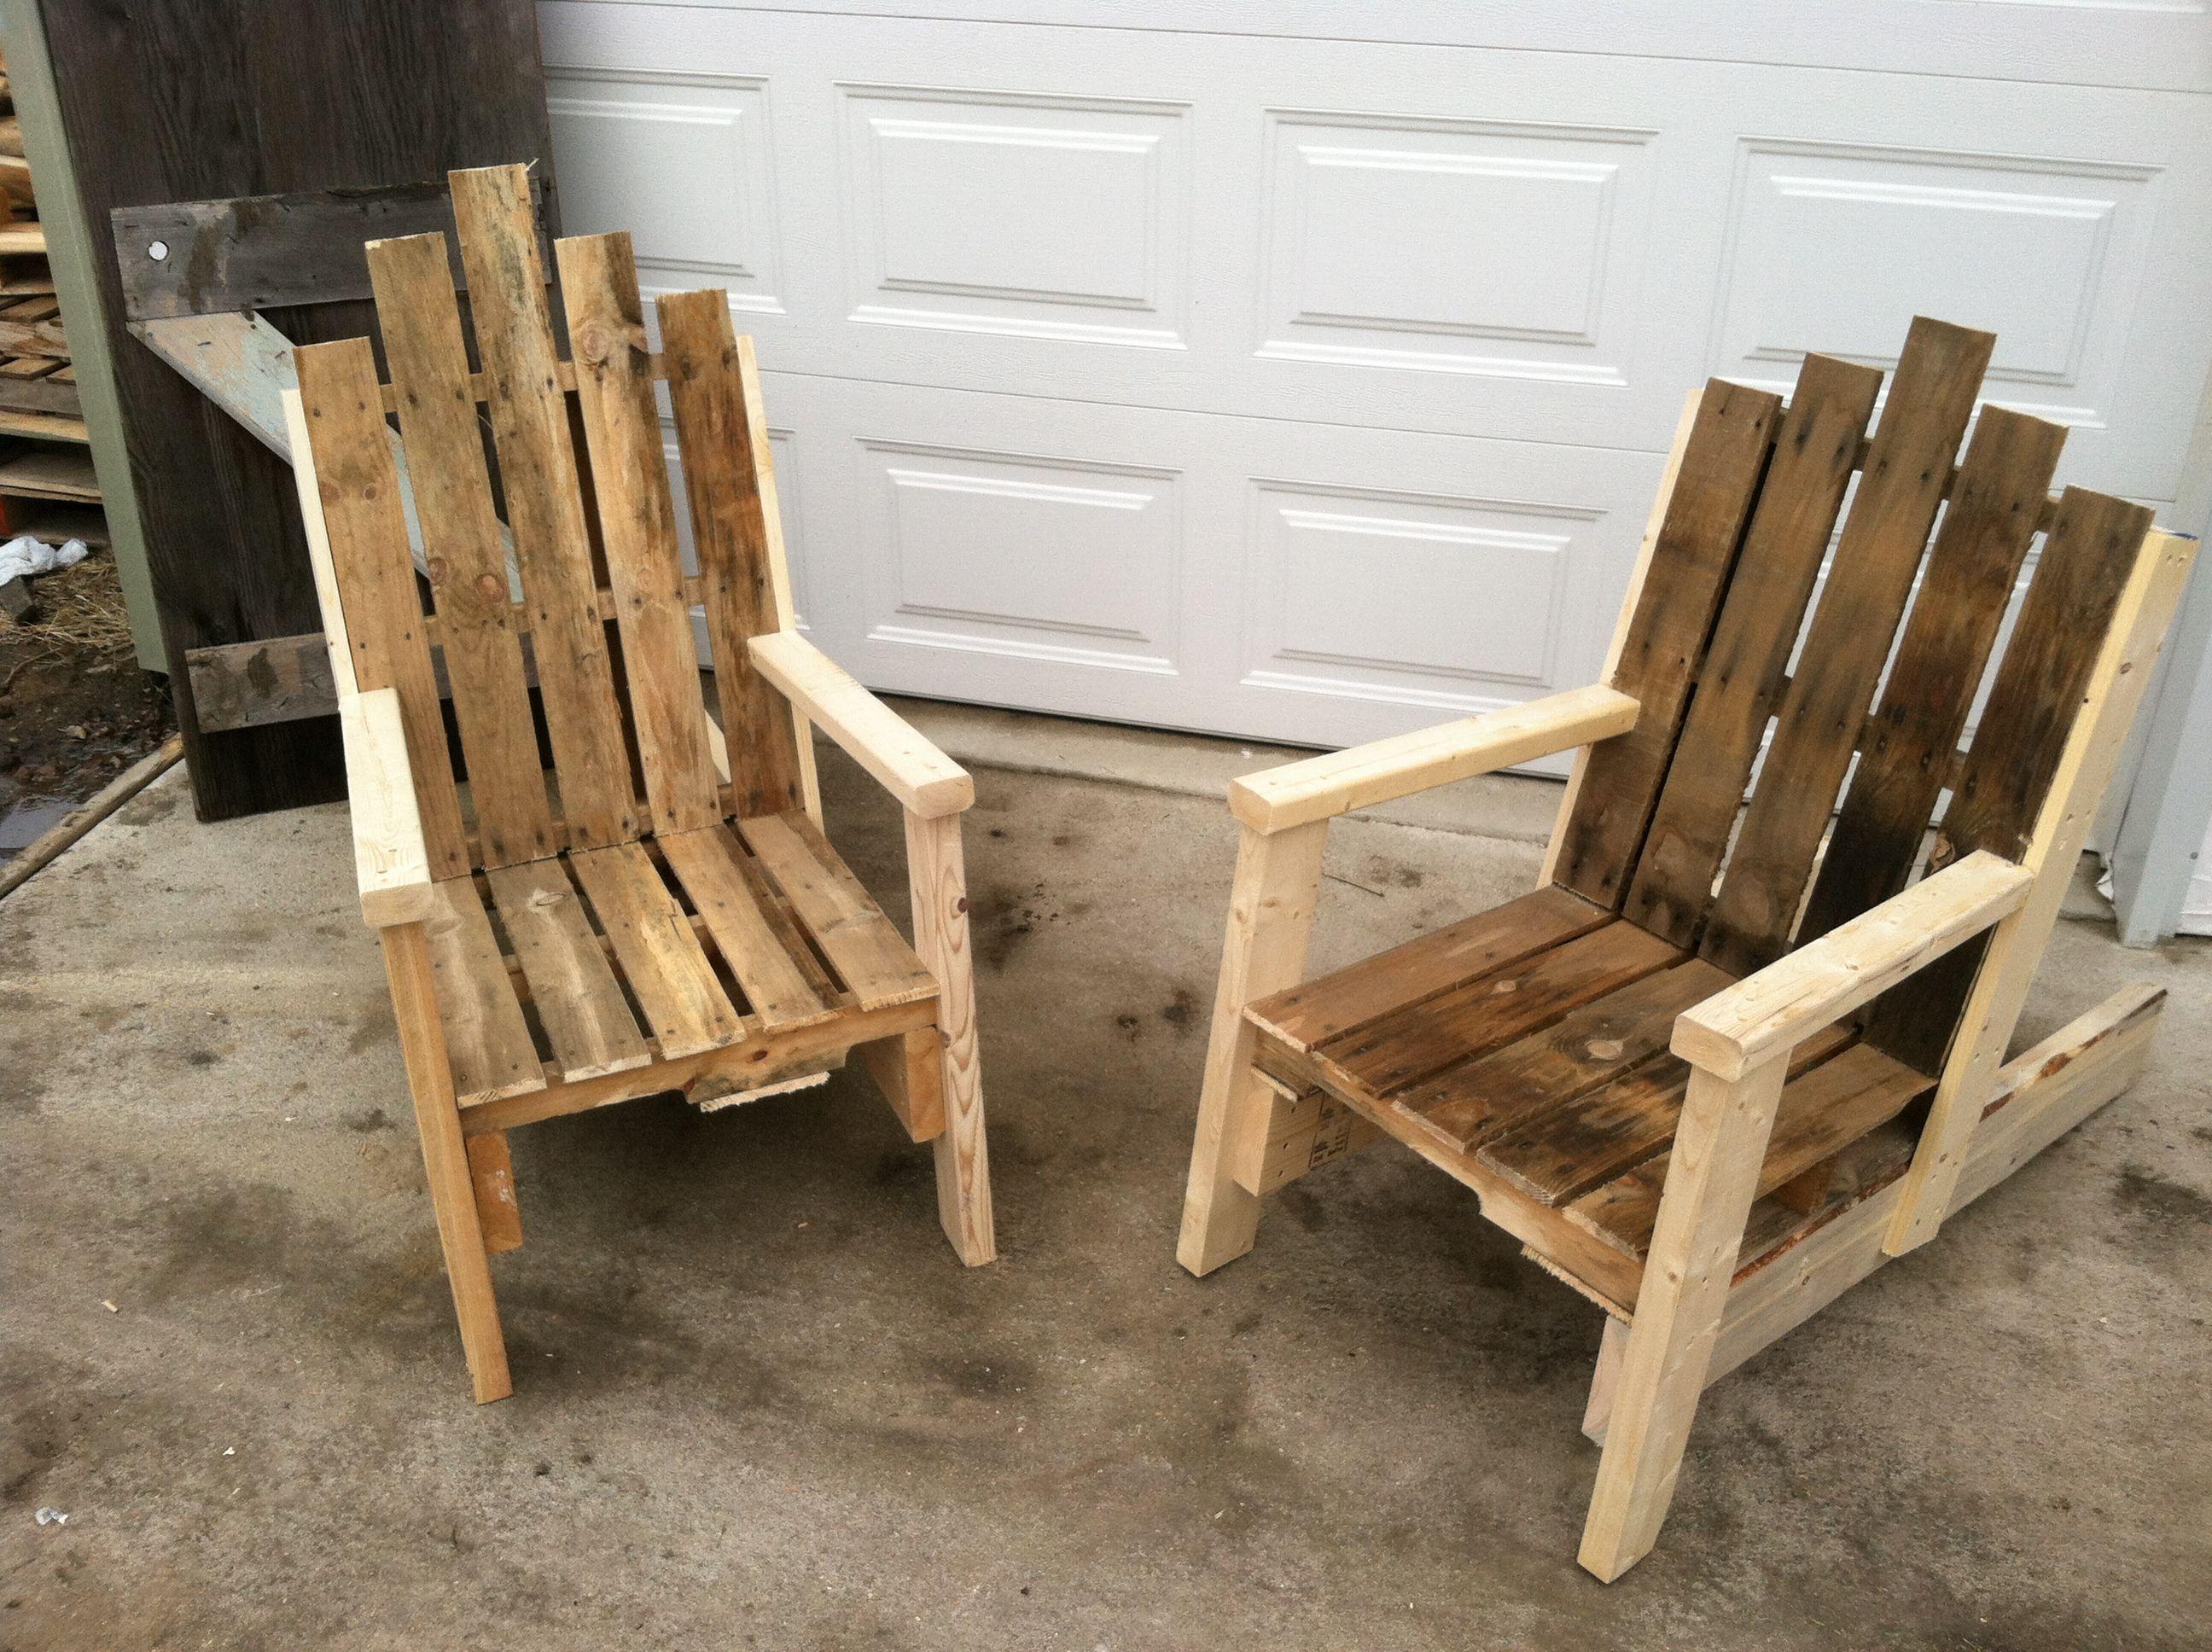 pallet design furniture. New Pallet Chair Design!! They Are Super Comfy! Design Furniture